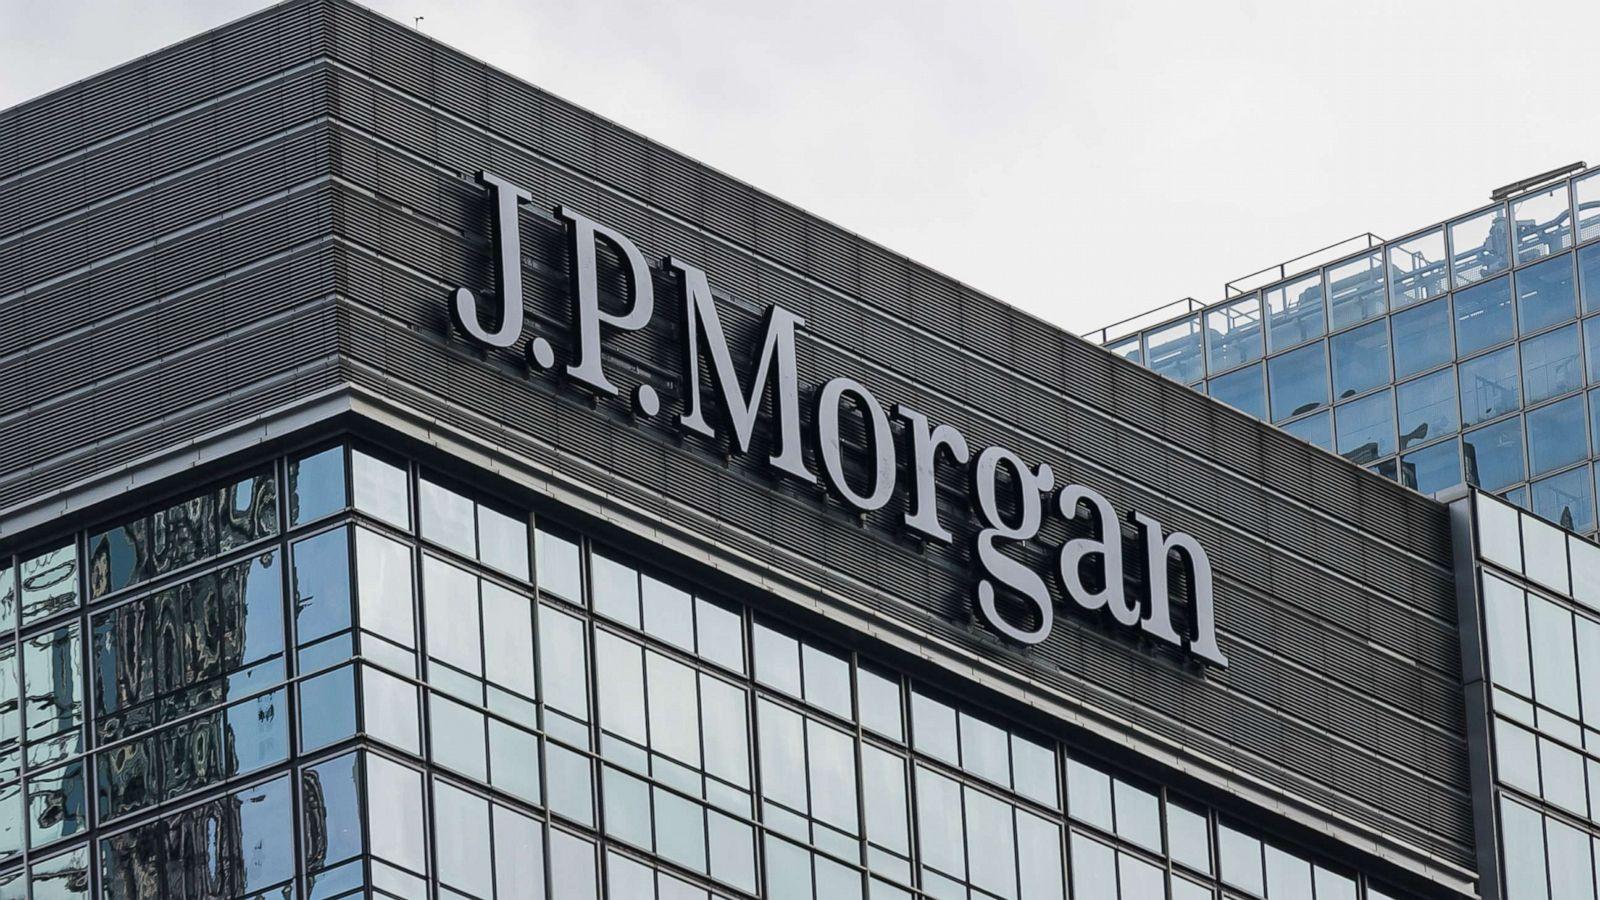 investirati u različite kriptovalute jp morgan chase ulaganje u kriptovalutu